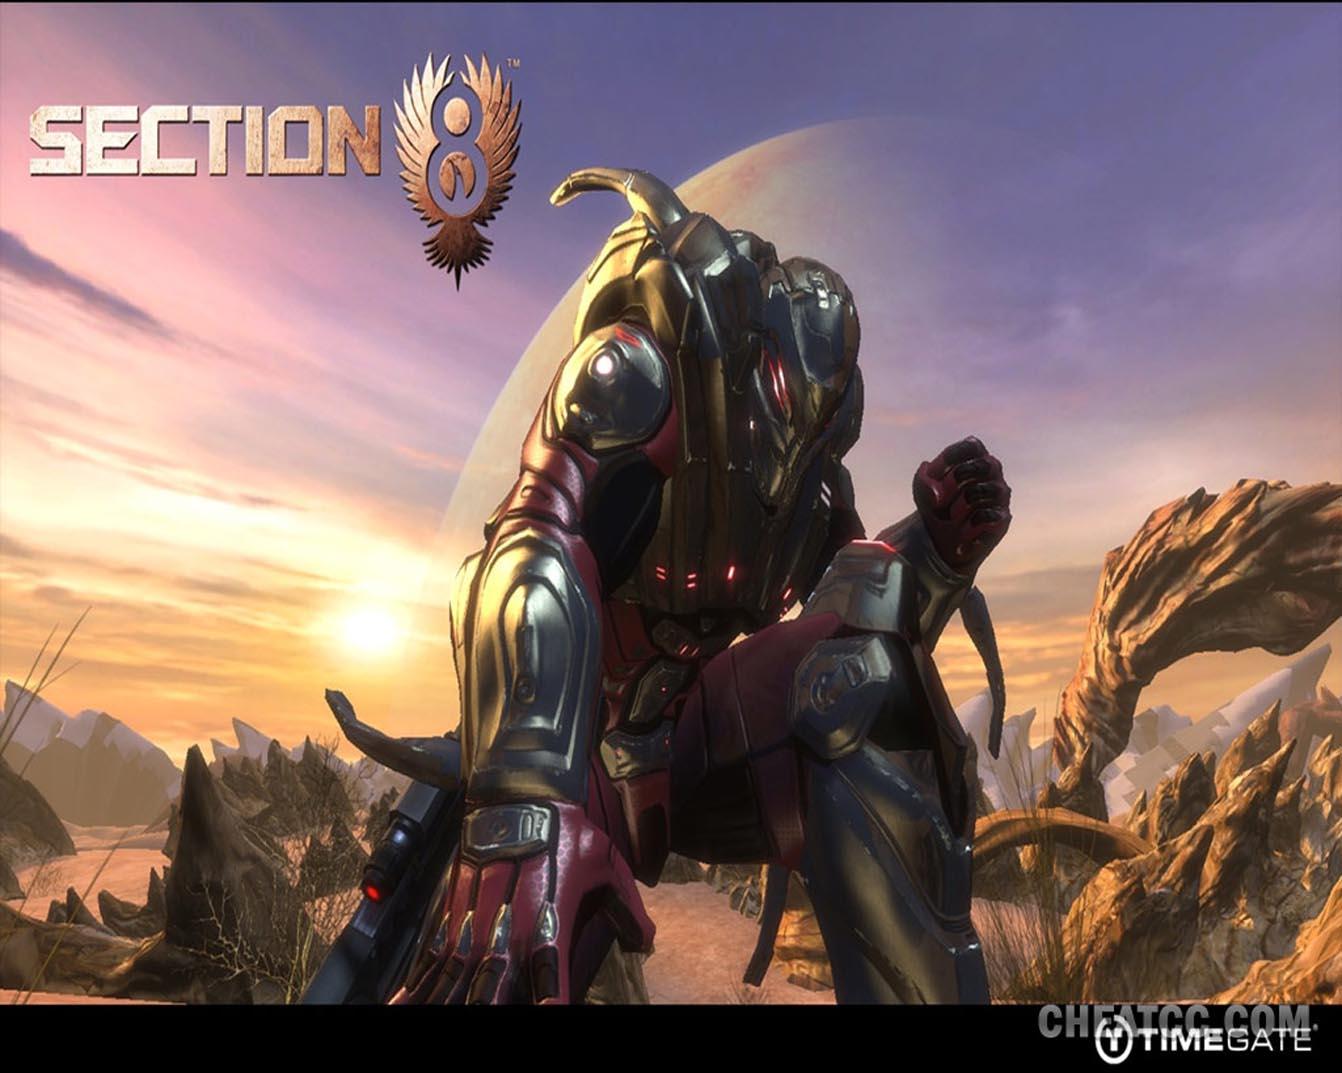 Section 8 Wallpaper Screenshot PC Game